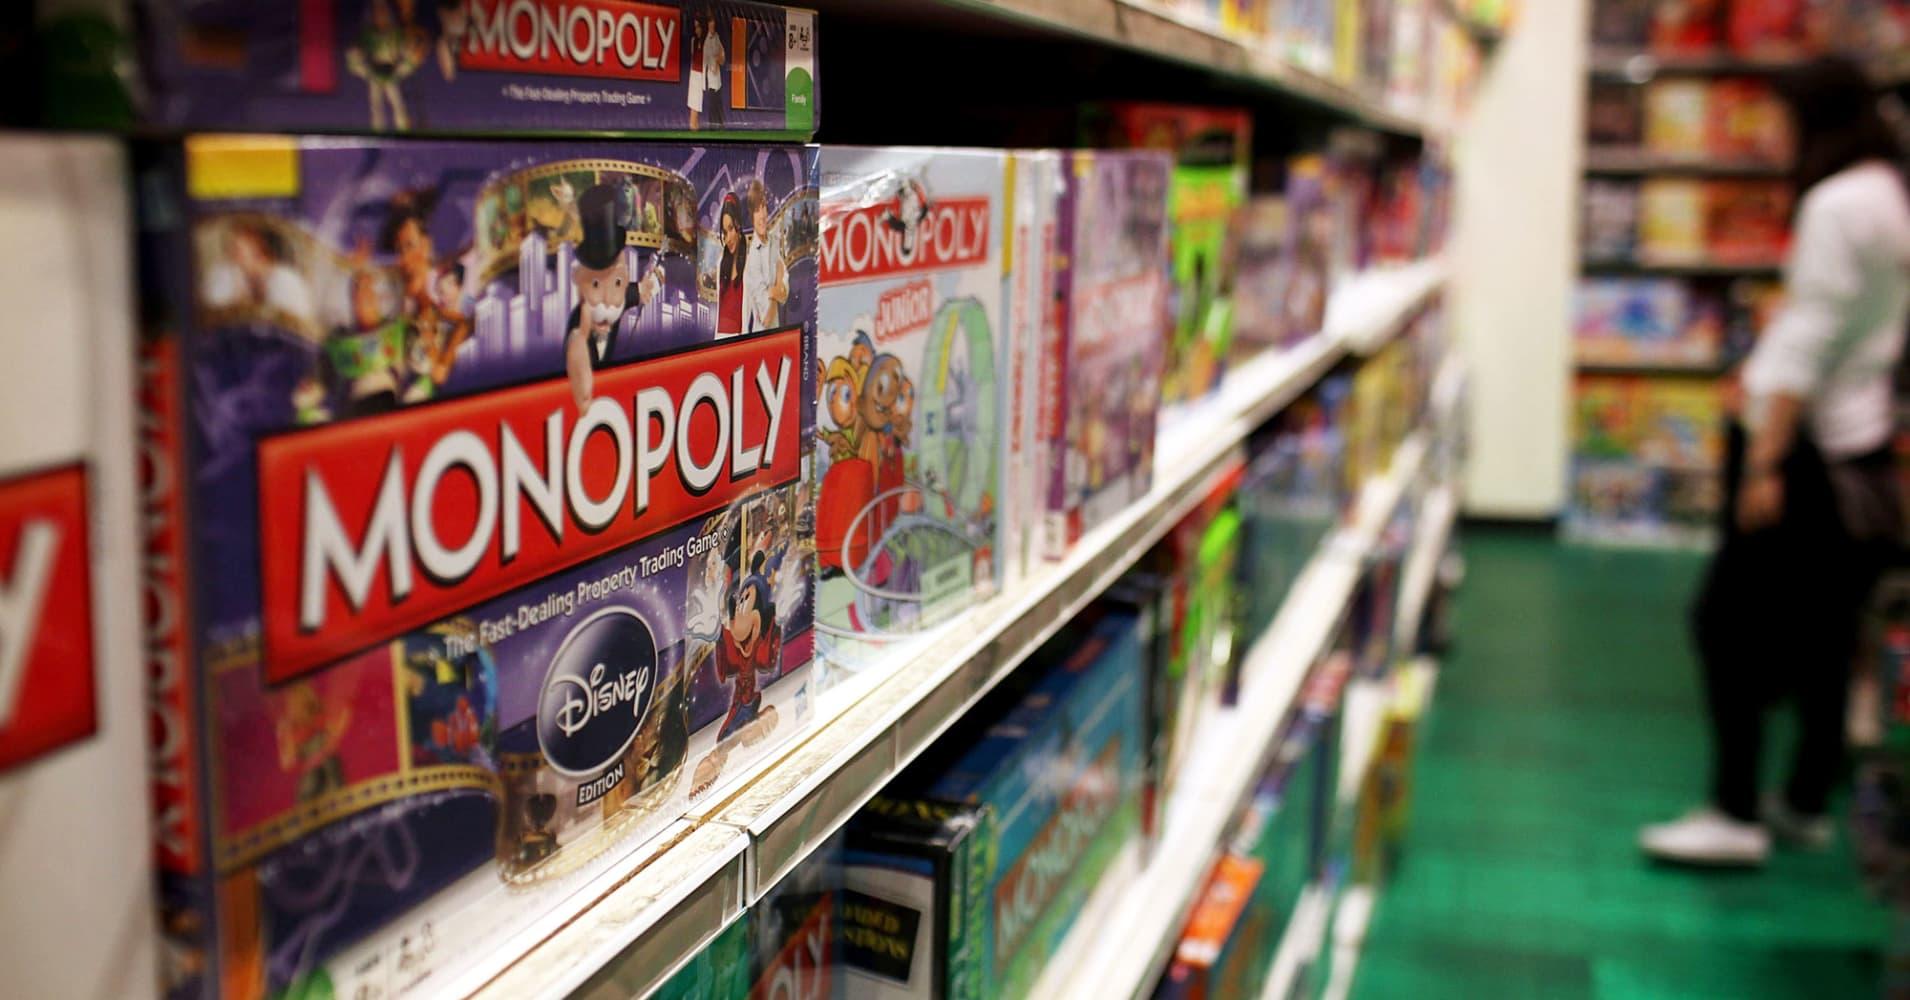 Toymaker Hasbro's quarterly revenue and profit top estimates